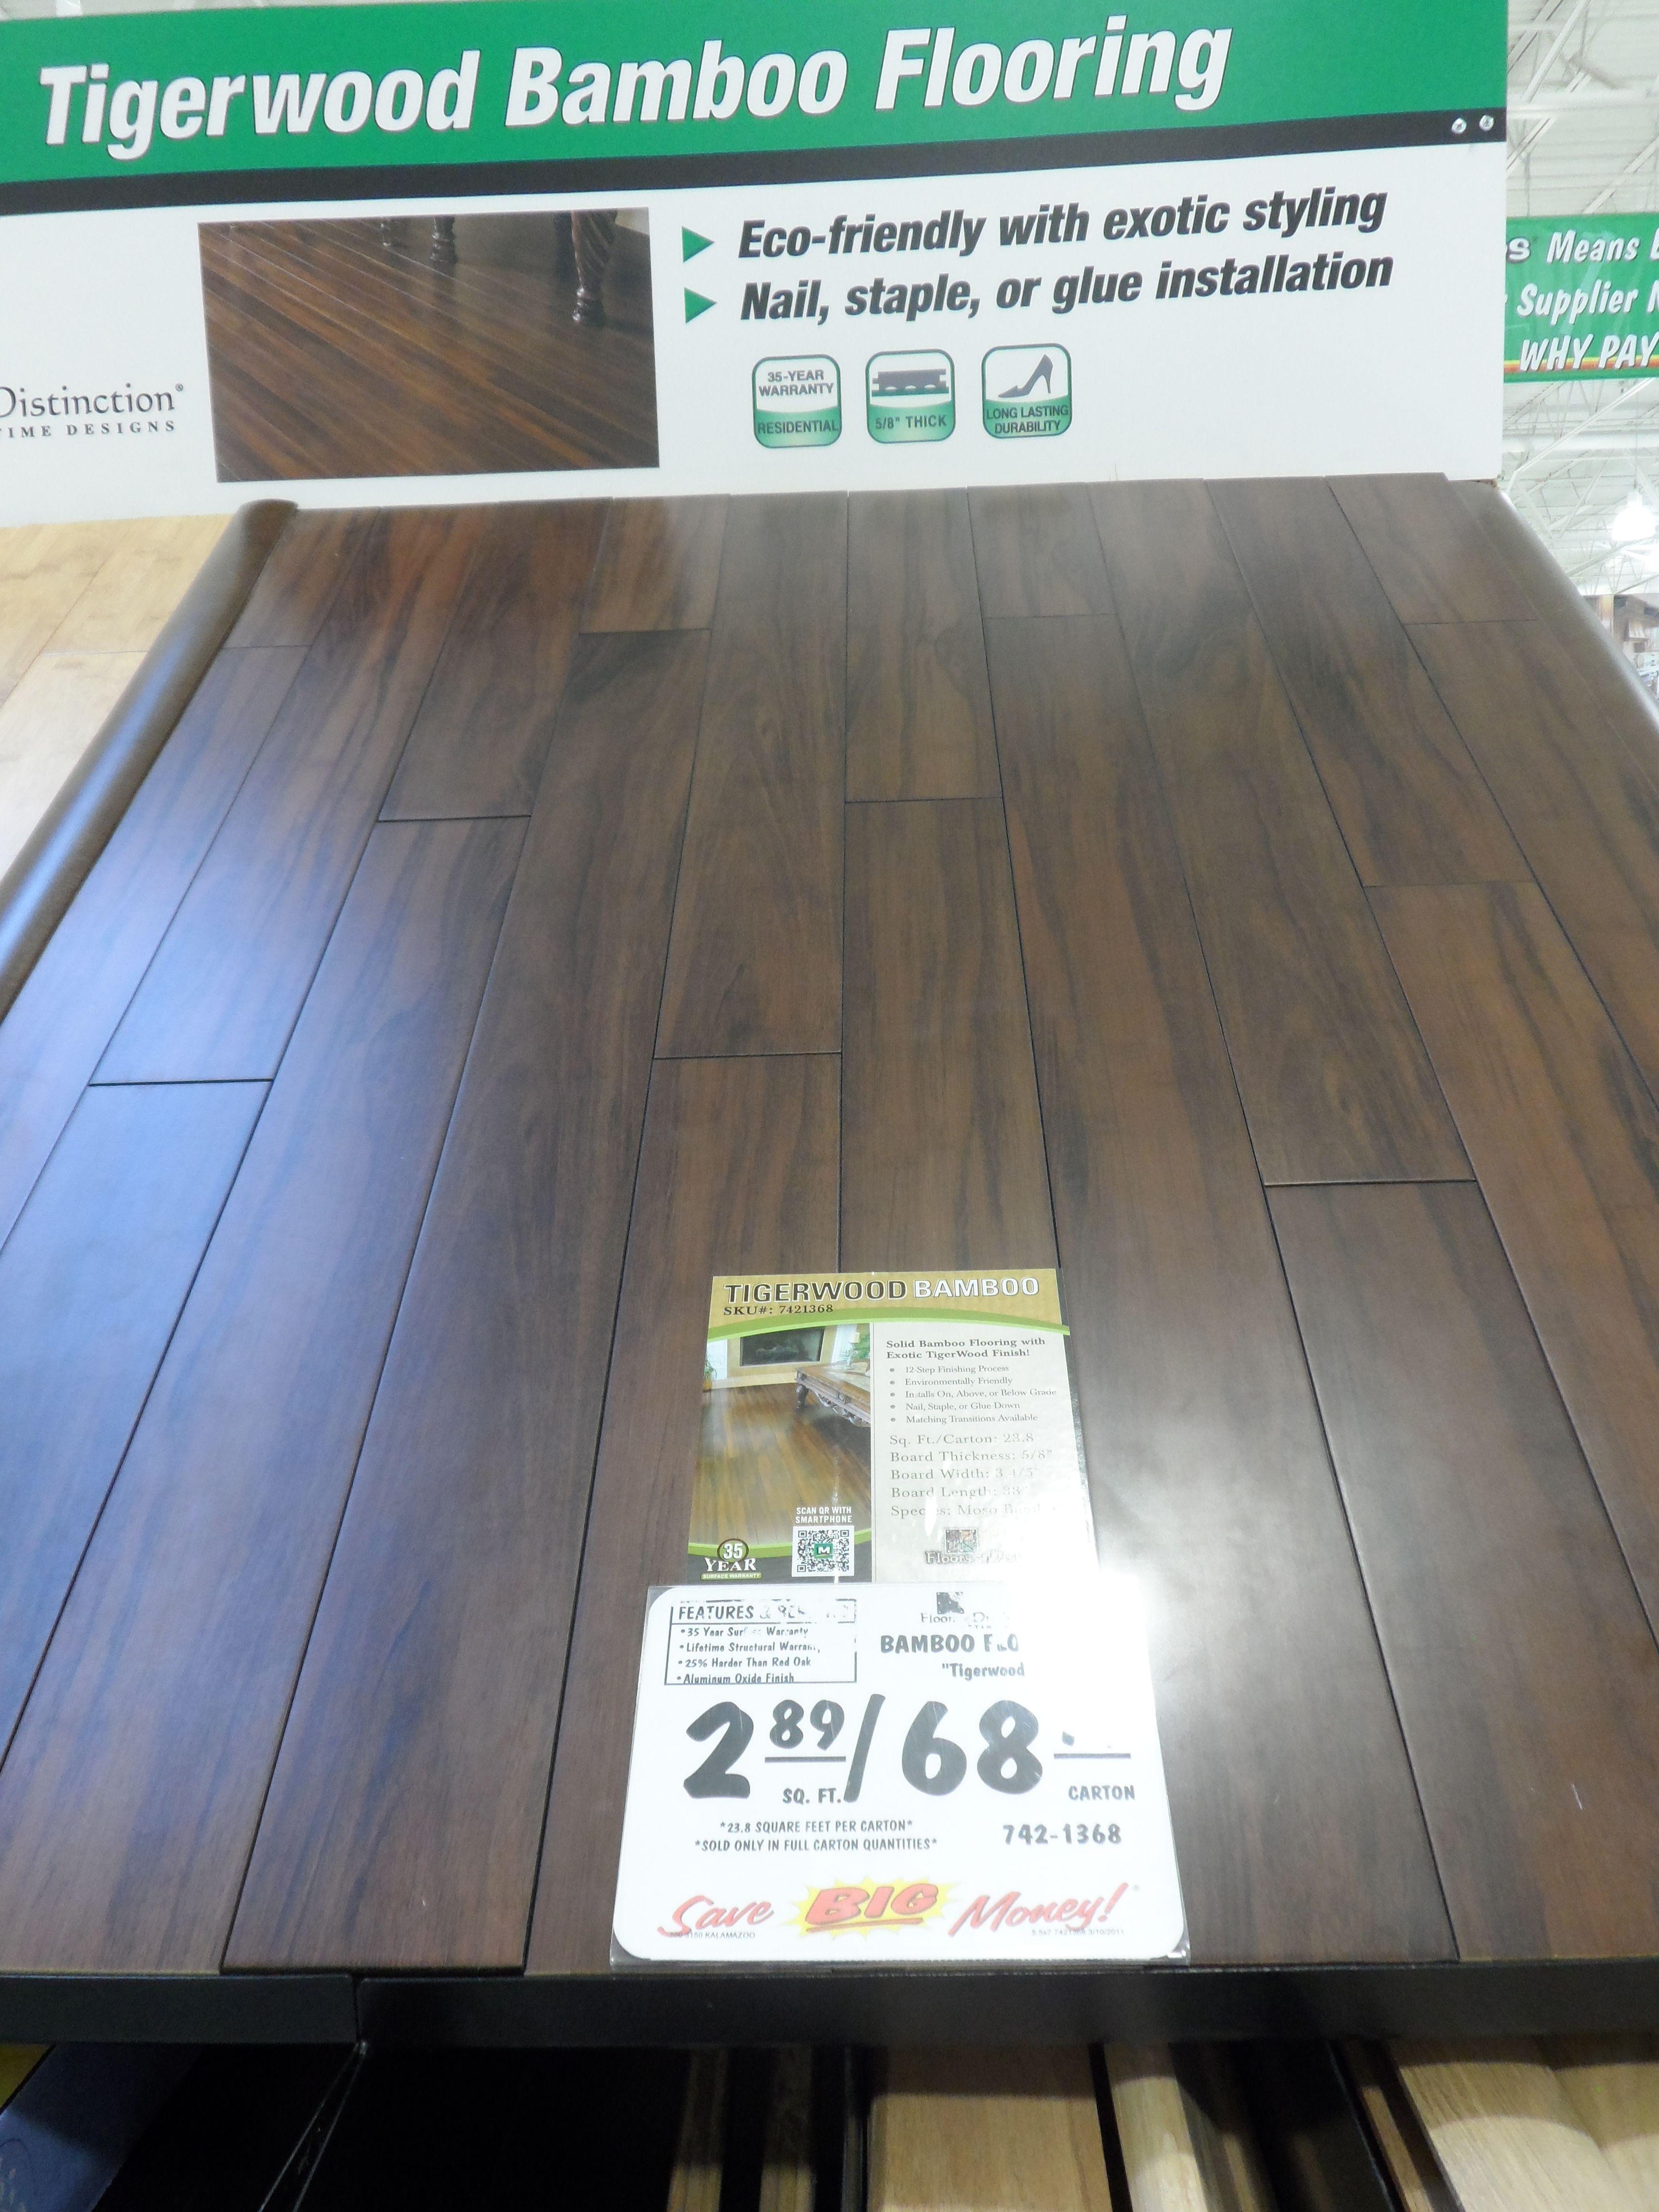 Tigerwood Bamboo Flooring Menards Flooring Bamboo Flooring